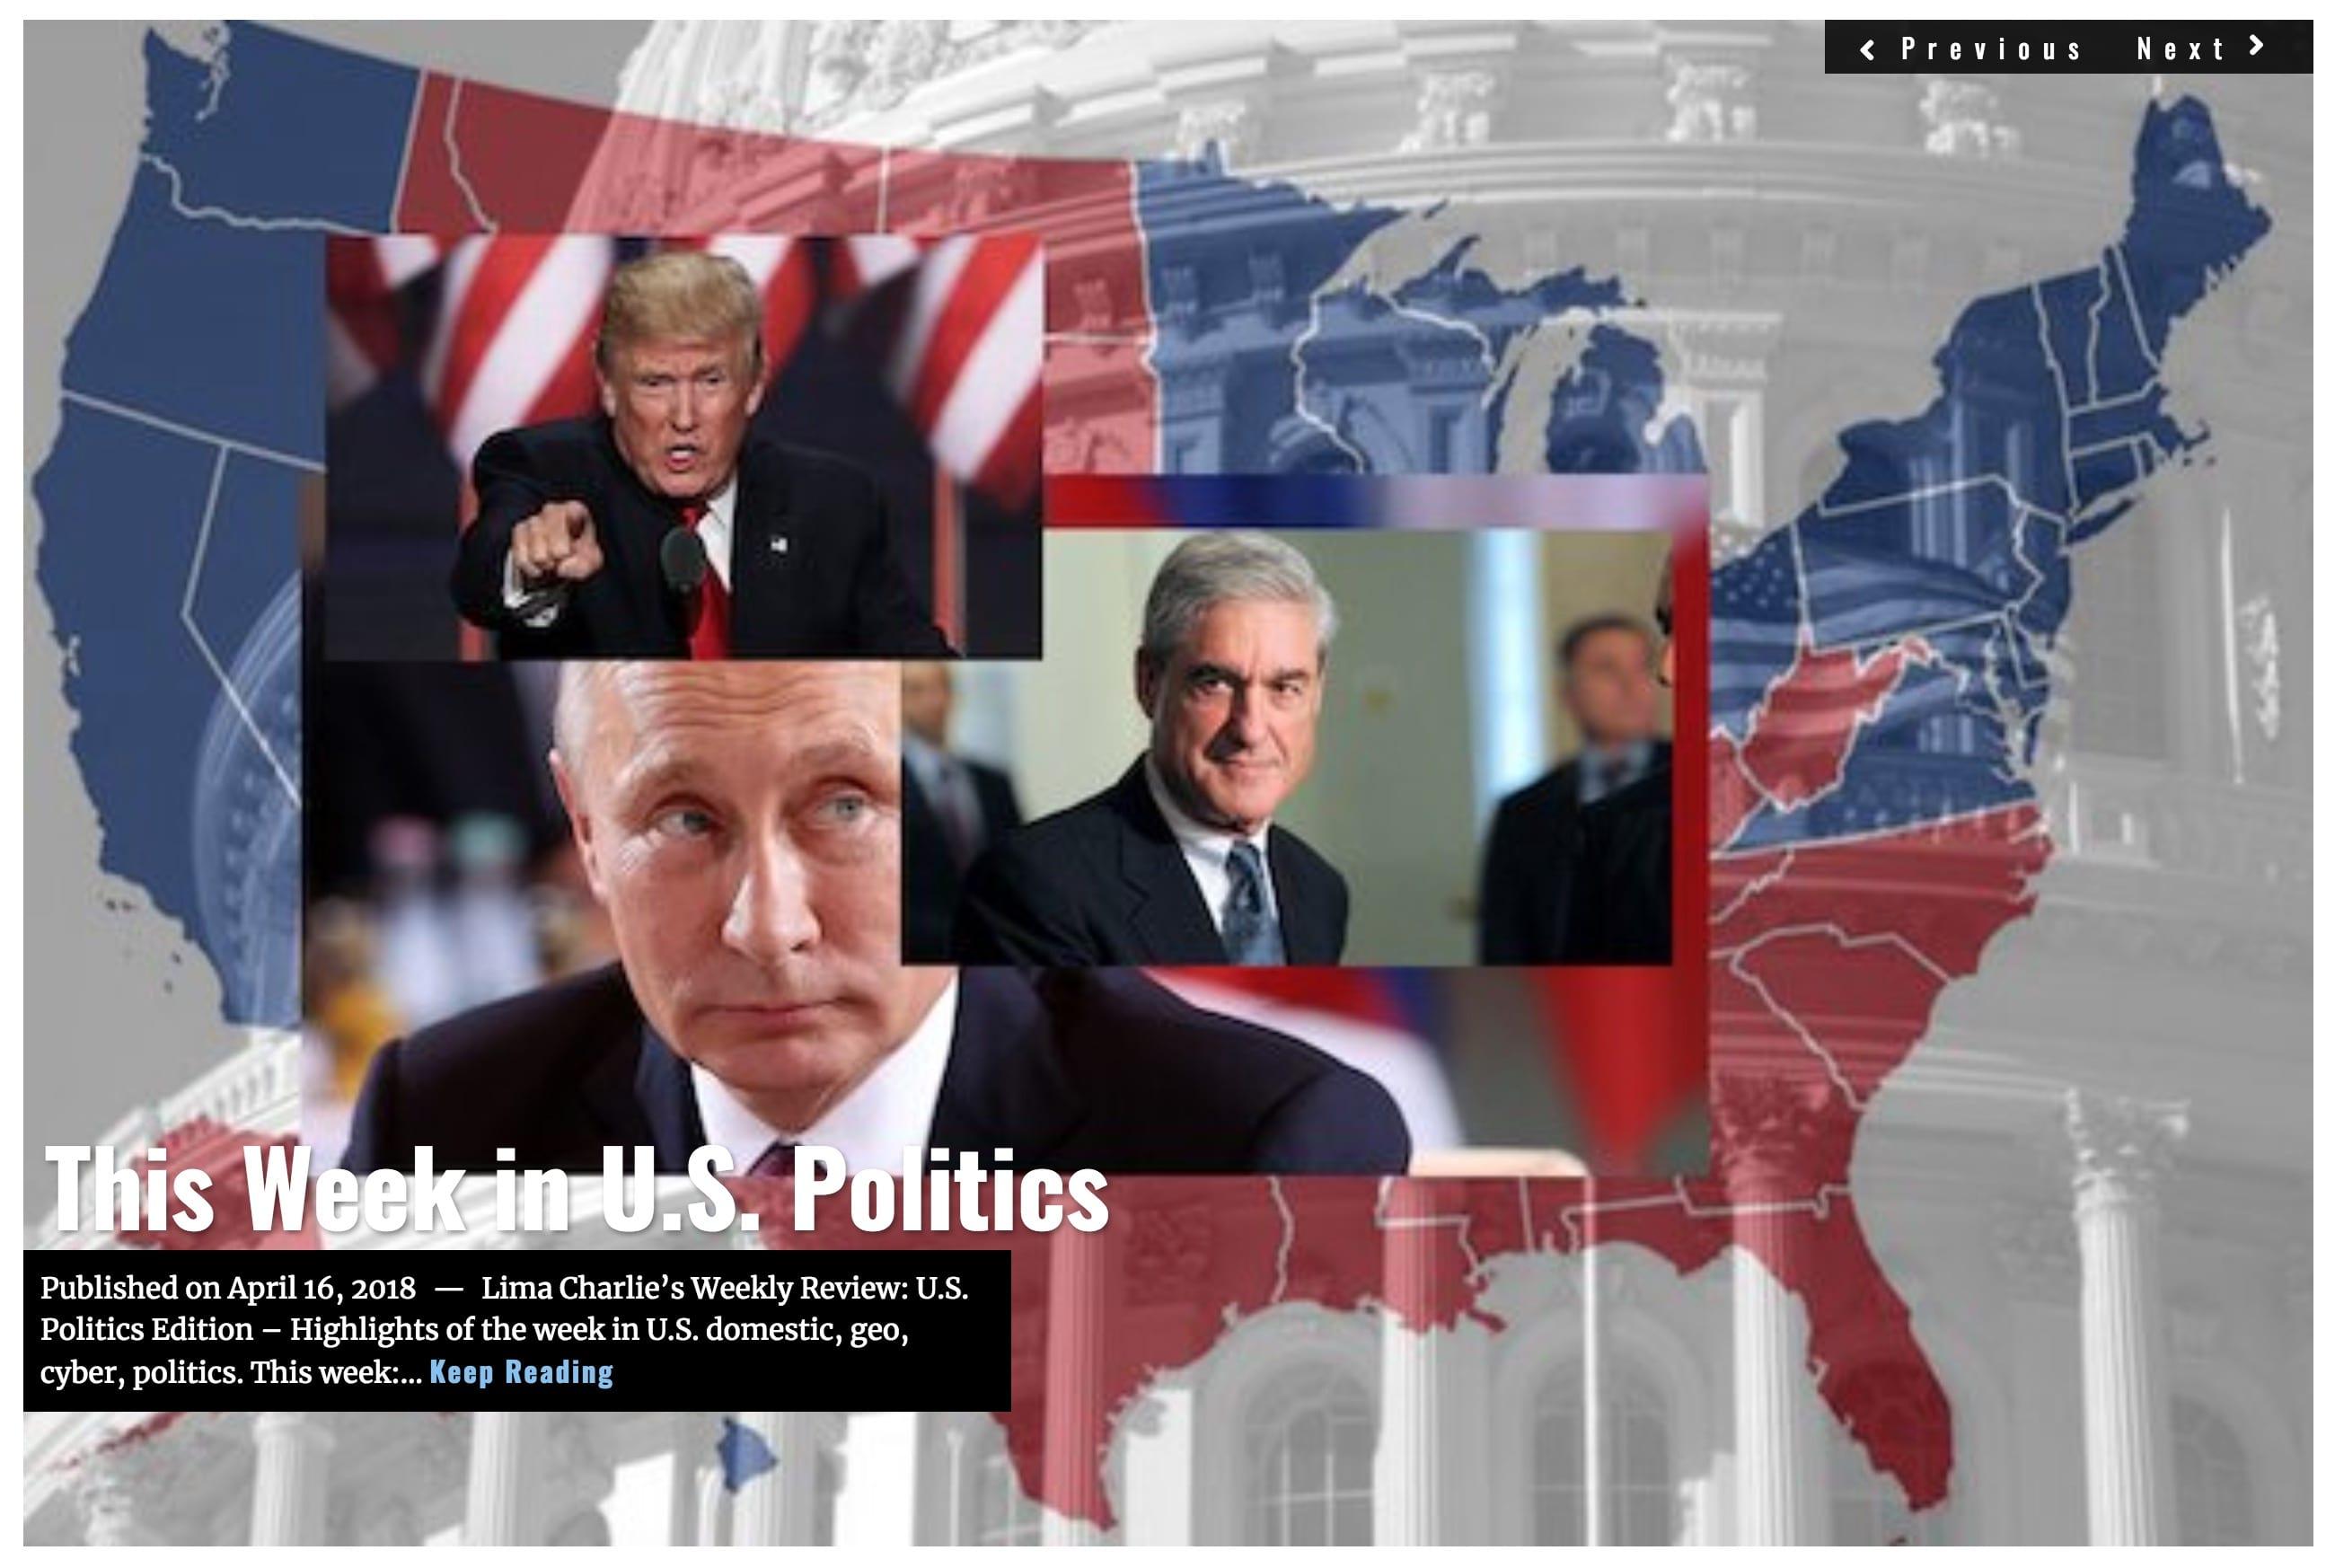 image Lima Charlie News Headline US Politcs Report APR 16 2018